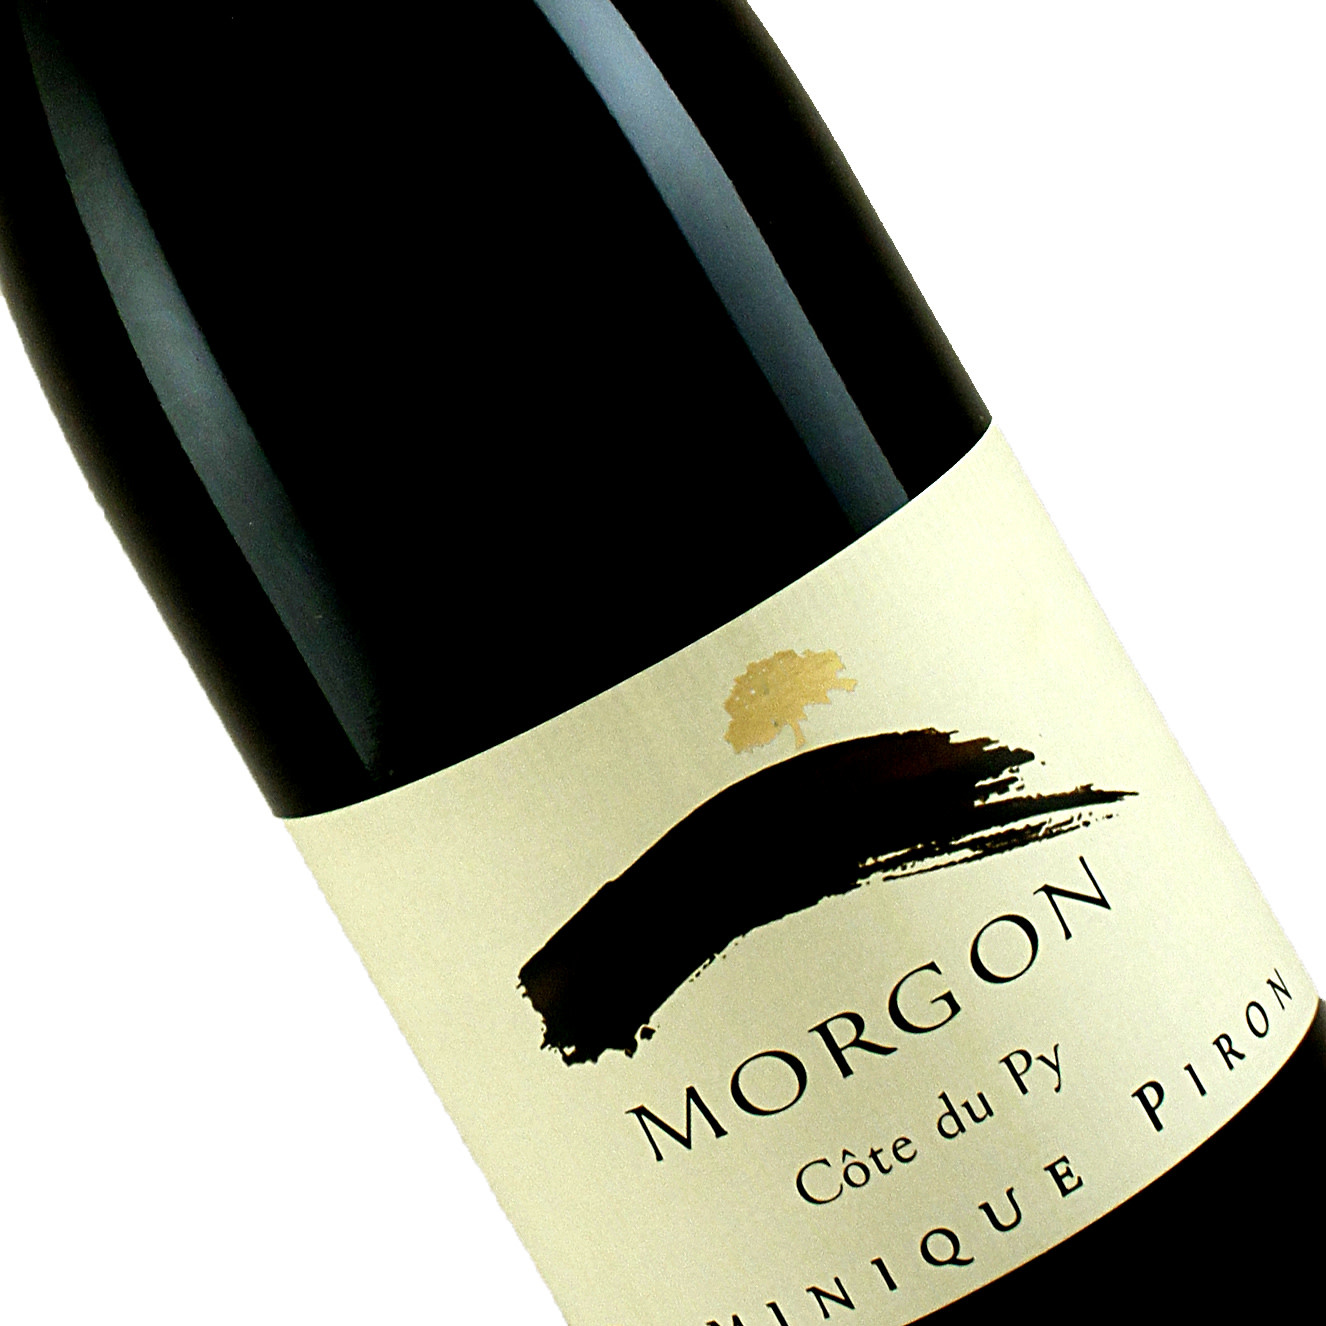 Dominique Piron 2018 Morgon Cote du Py, Beaujolais